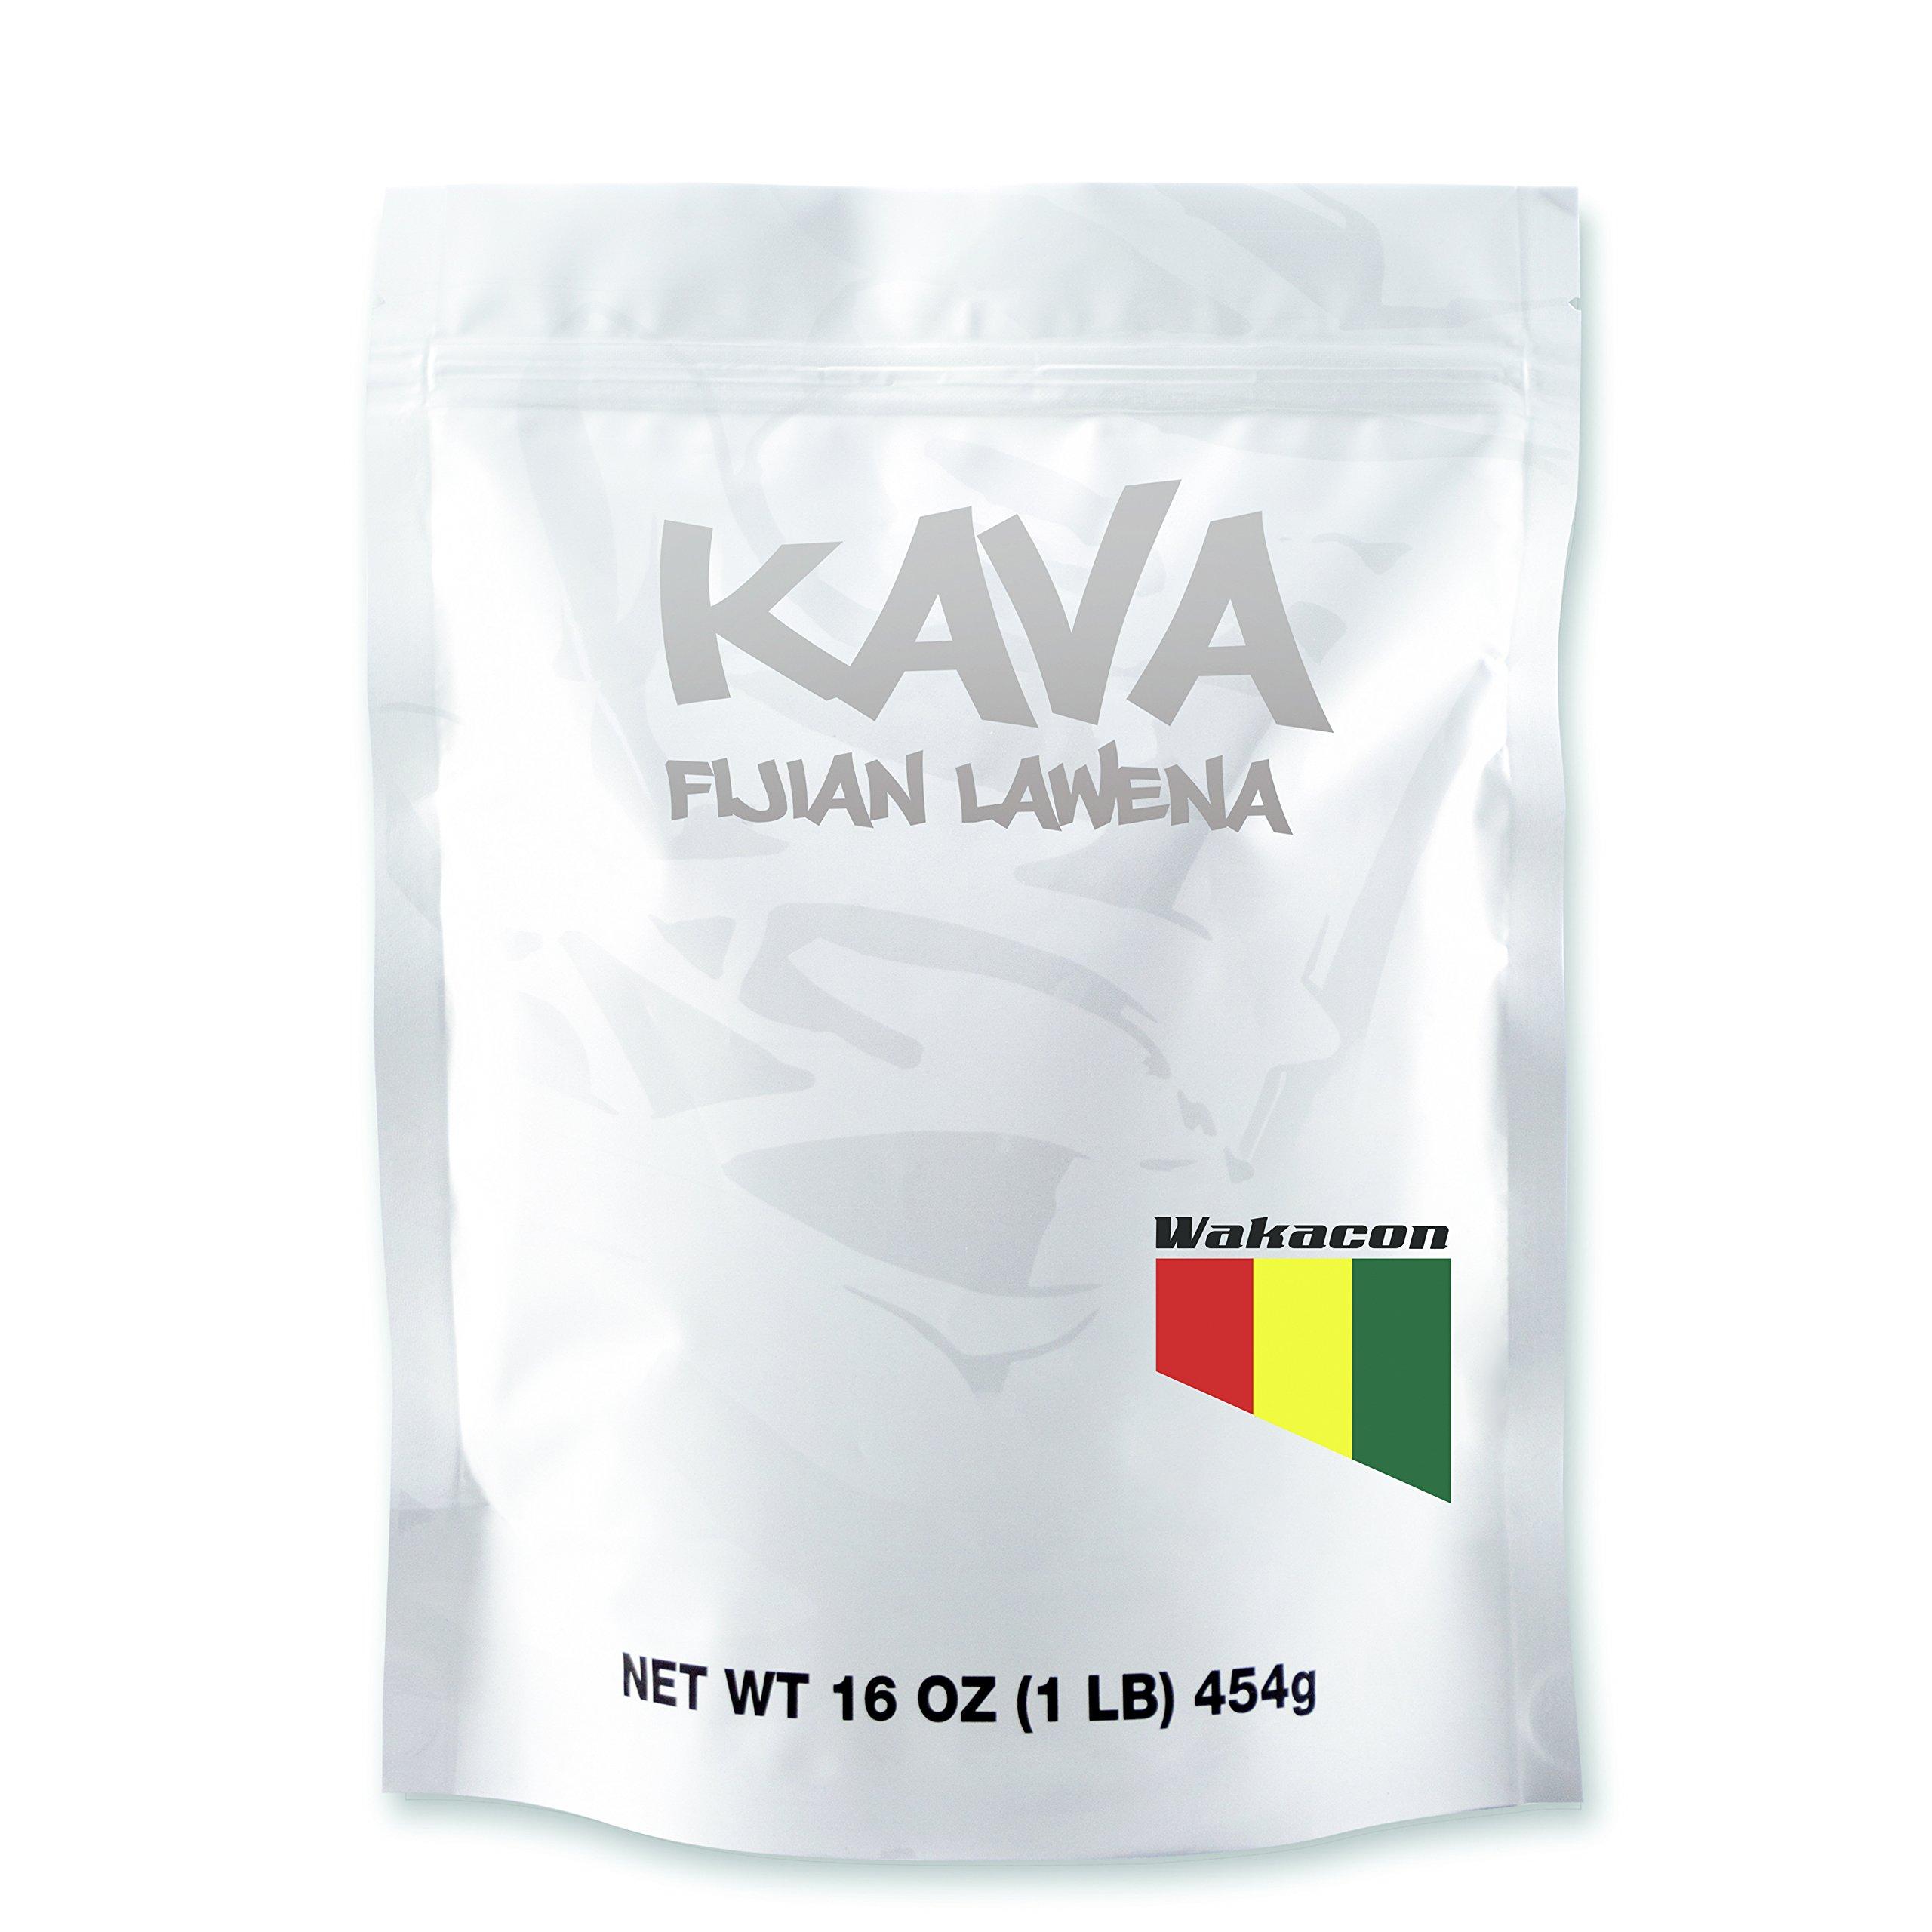 Wakacon KAVA LAWENA Powder - Fijian Noble Premium High Quality Kava Root (16oz) by Wakacon